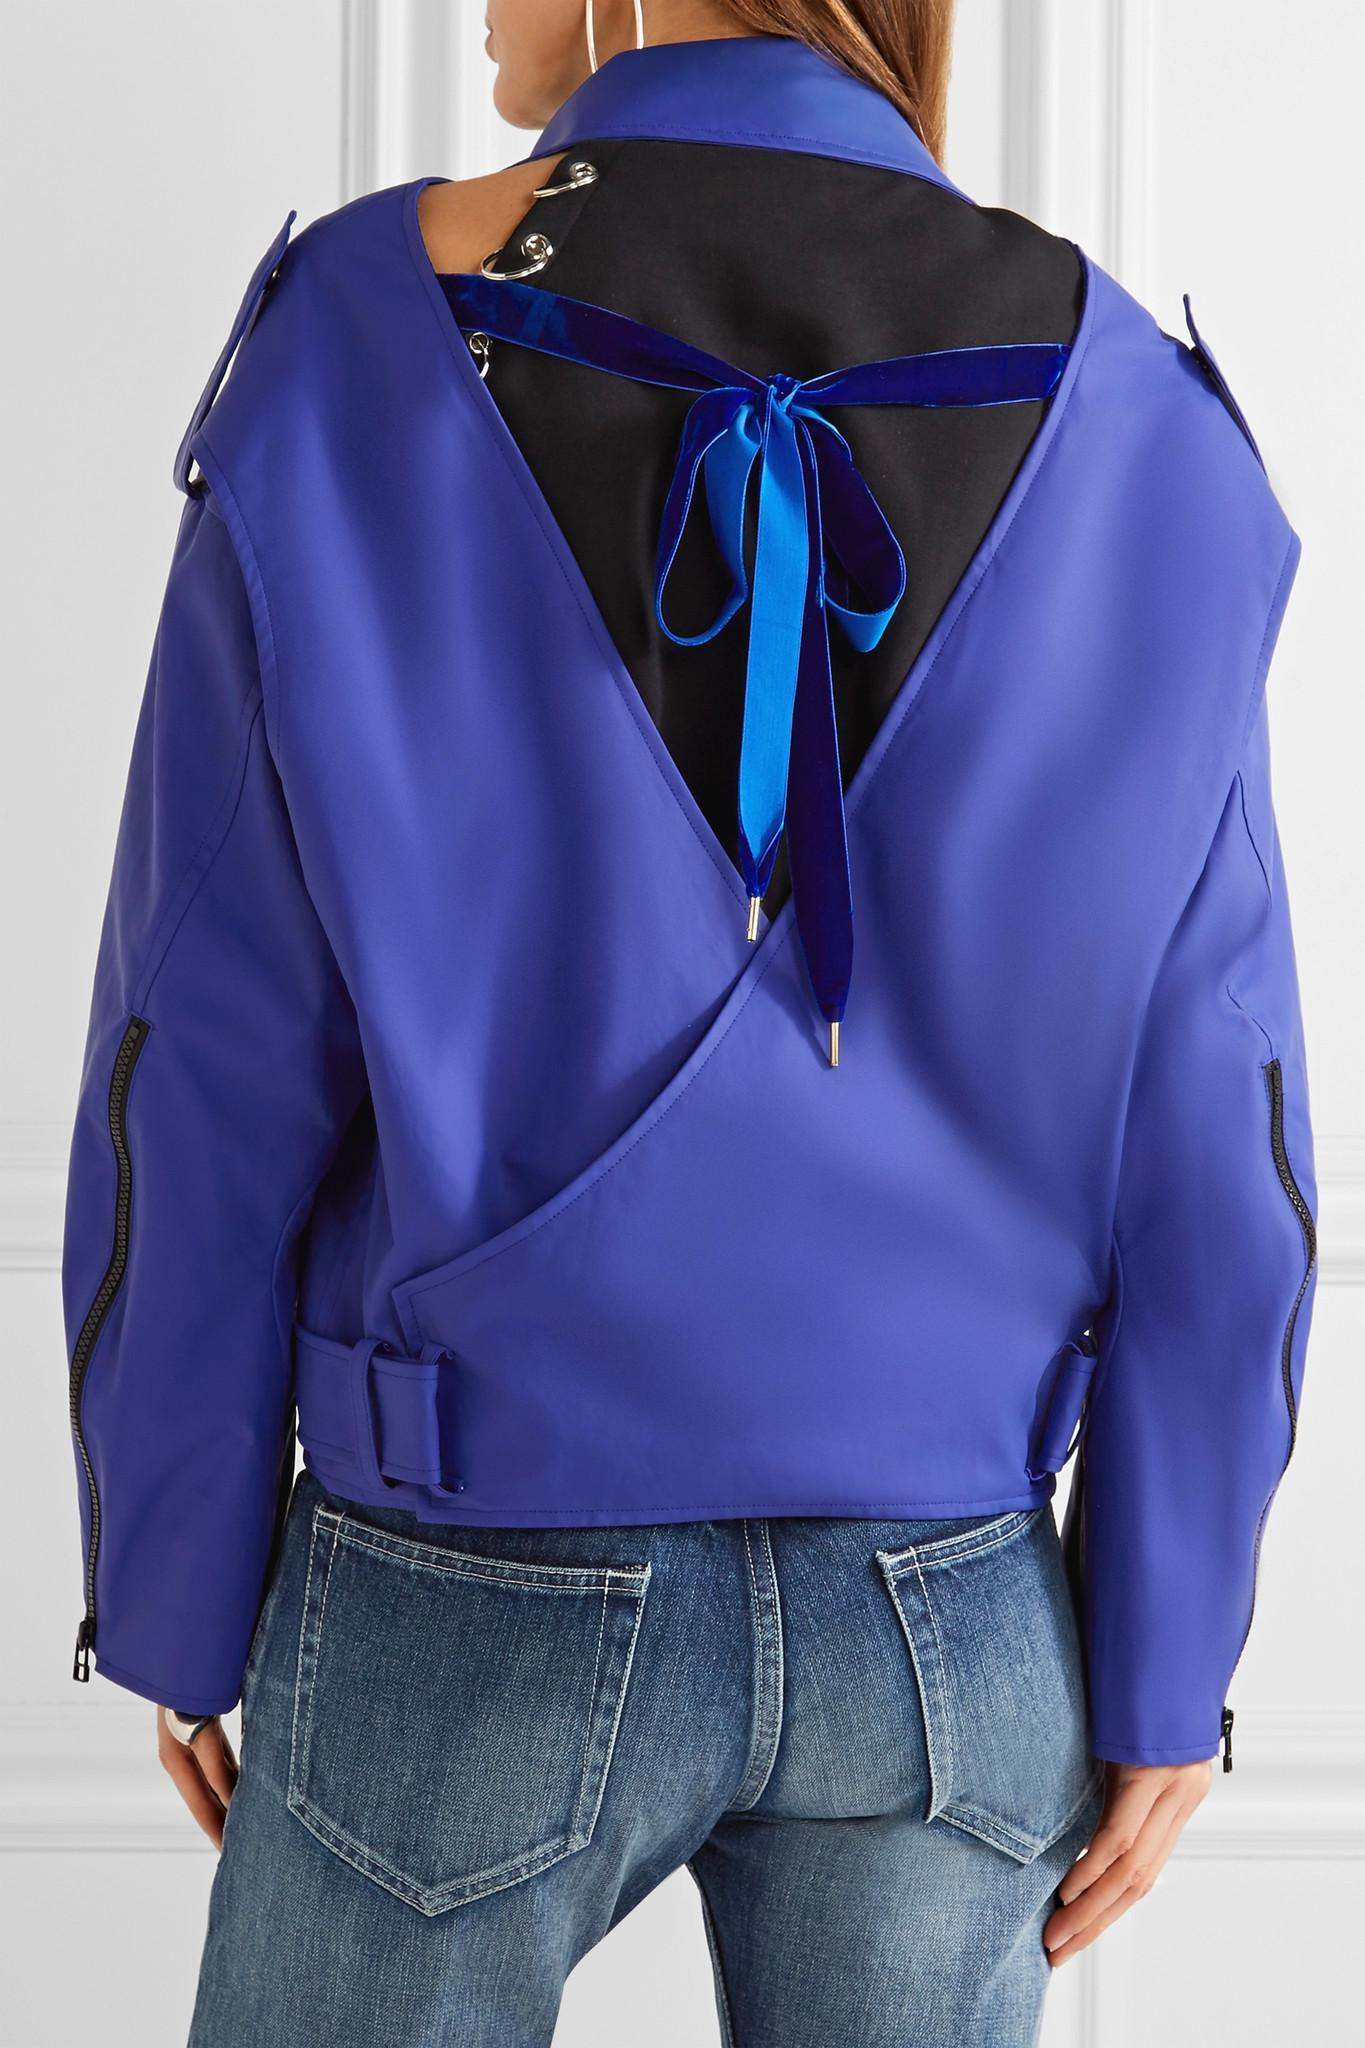 Bright blue leather jacket